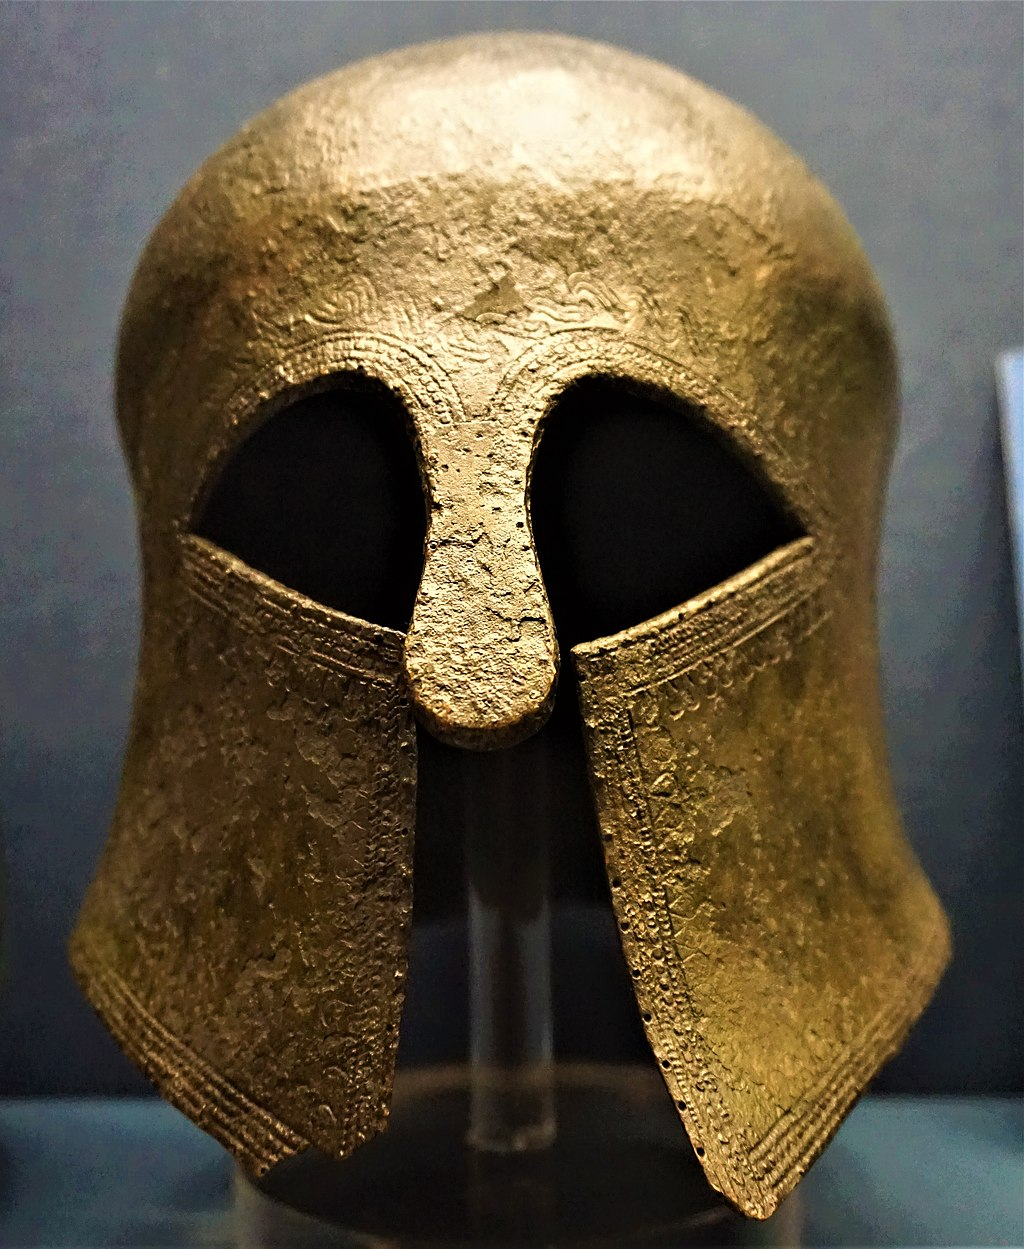 Corinthian Helmet - Benaki Museum, Athens